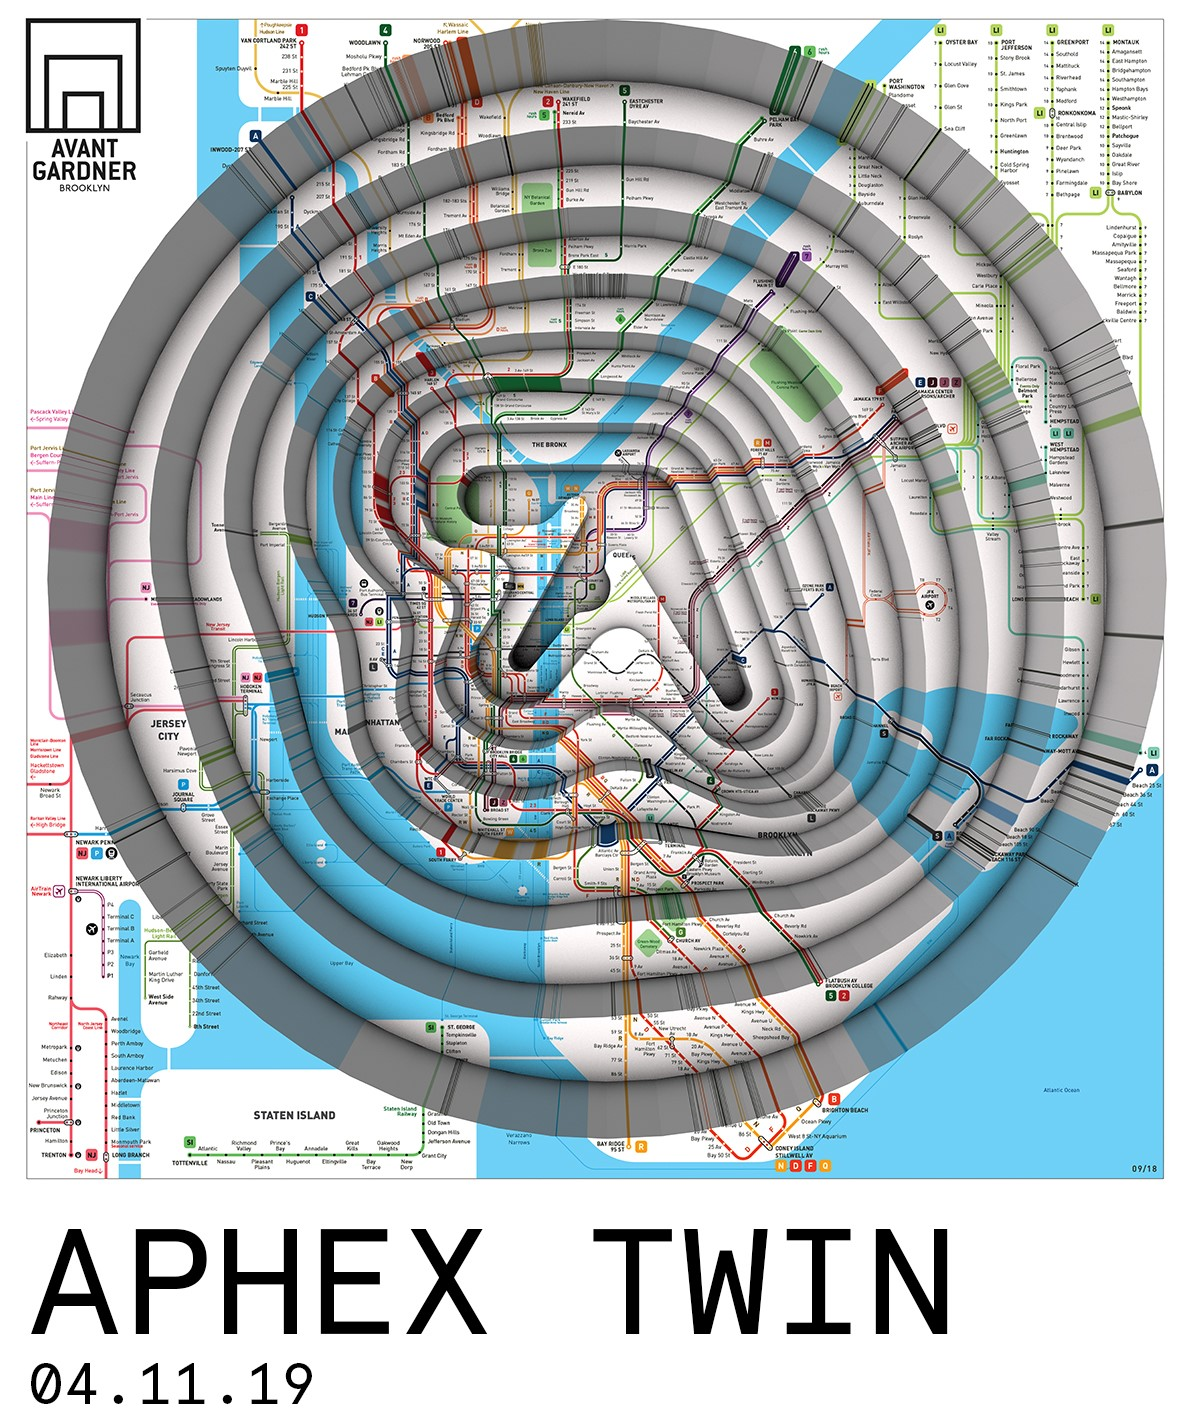 aphex-twin-avant-gardner-poster.jpg